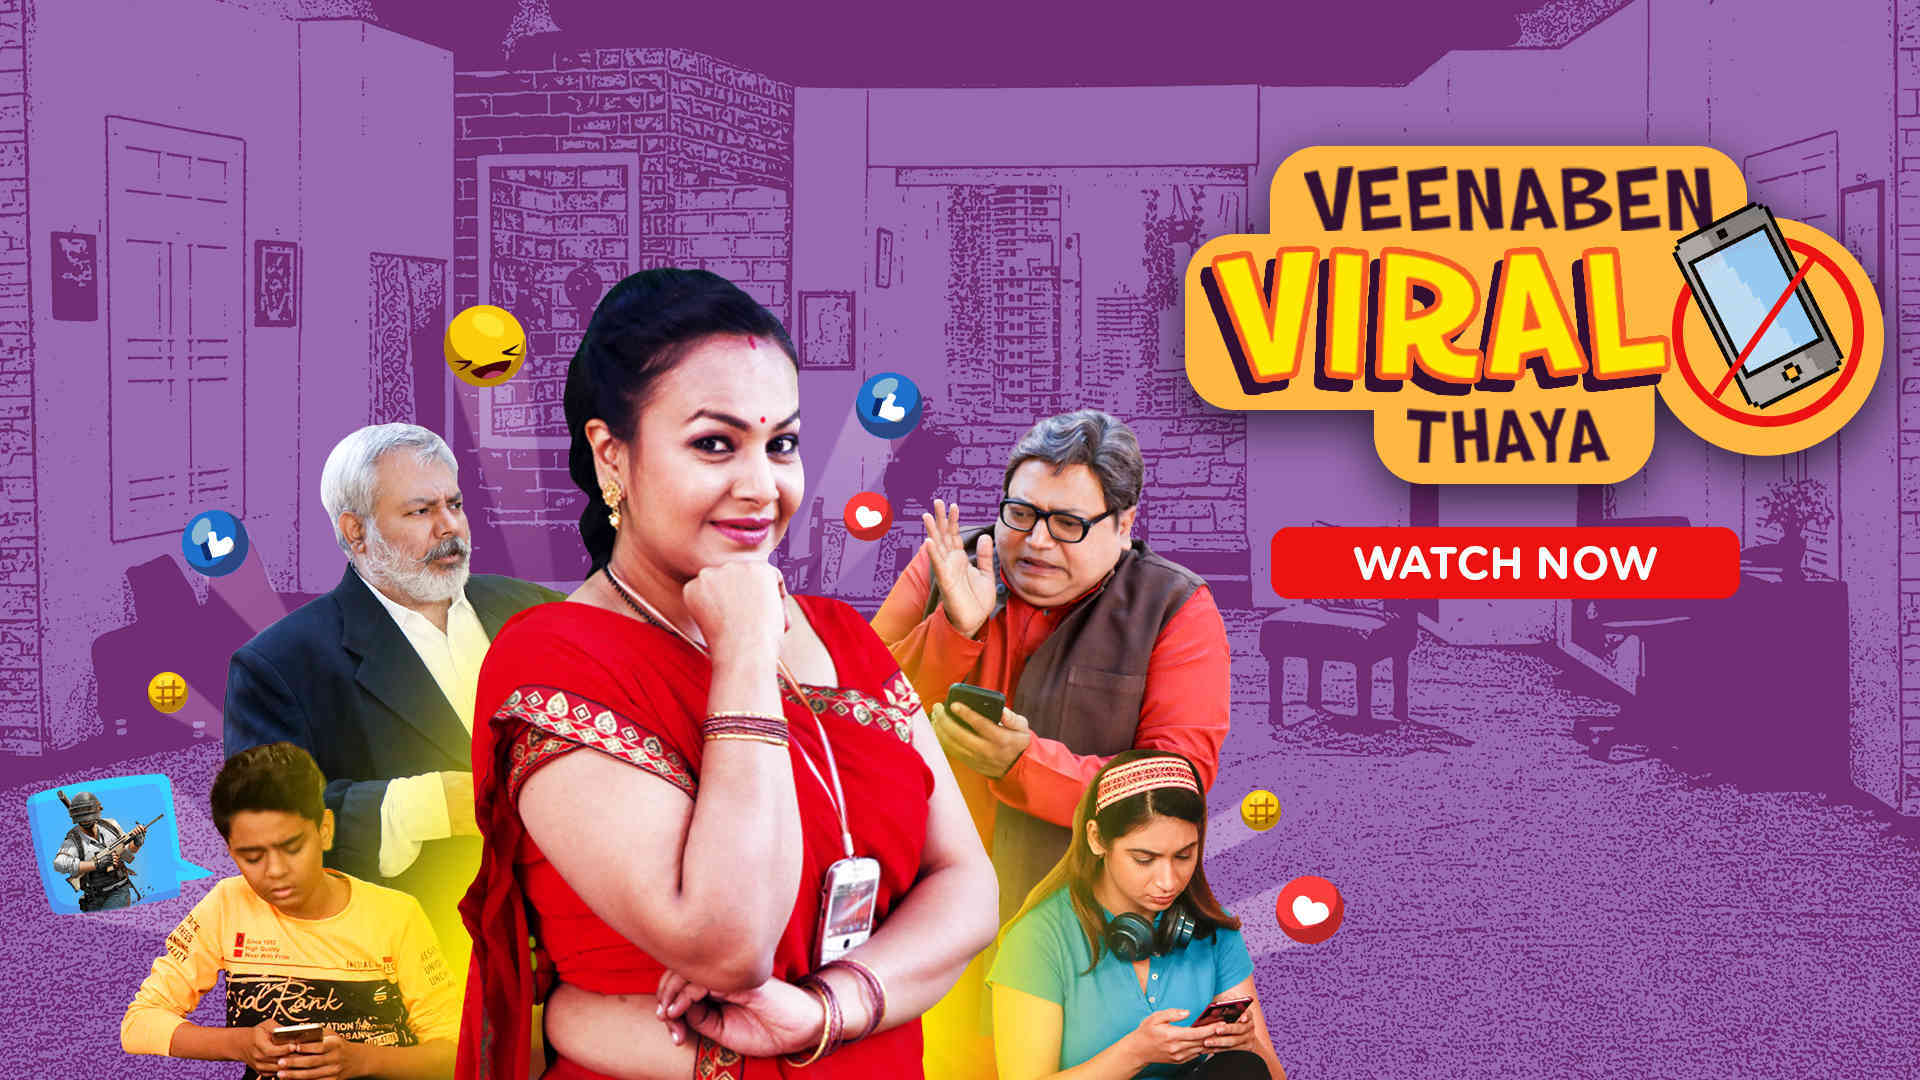 Veenaben Viral Thaya